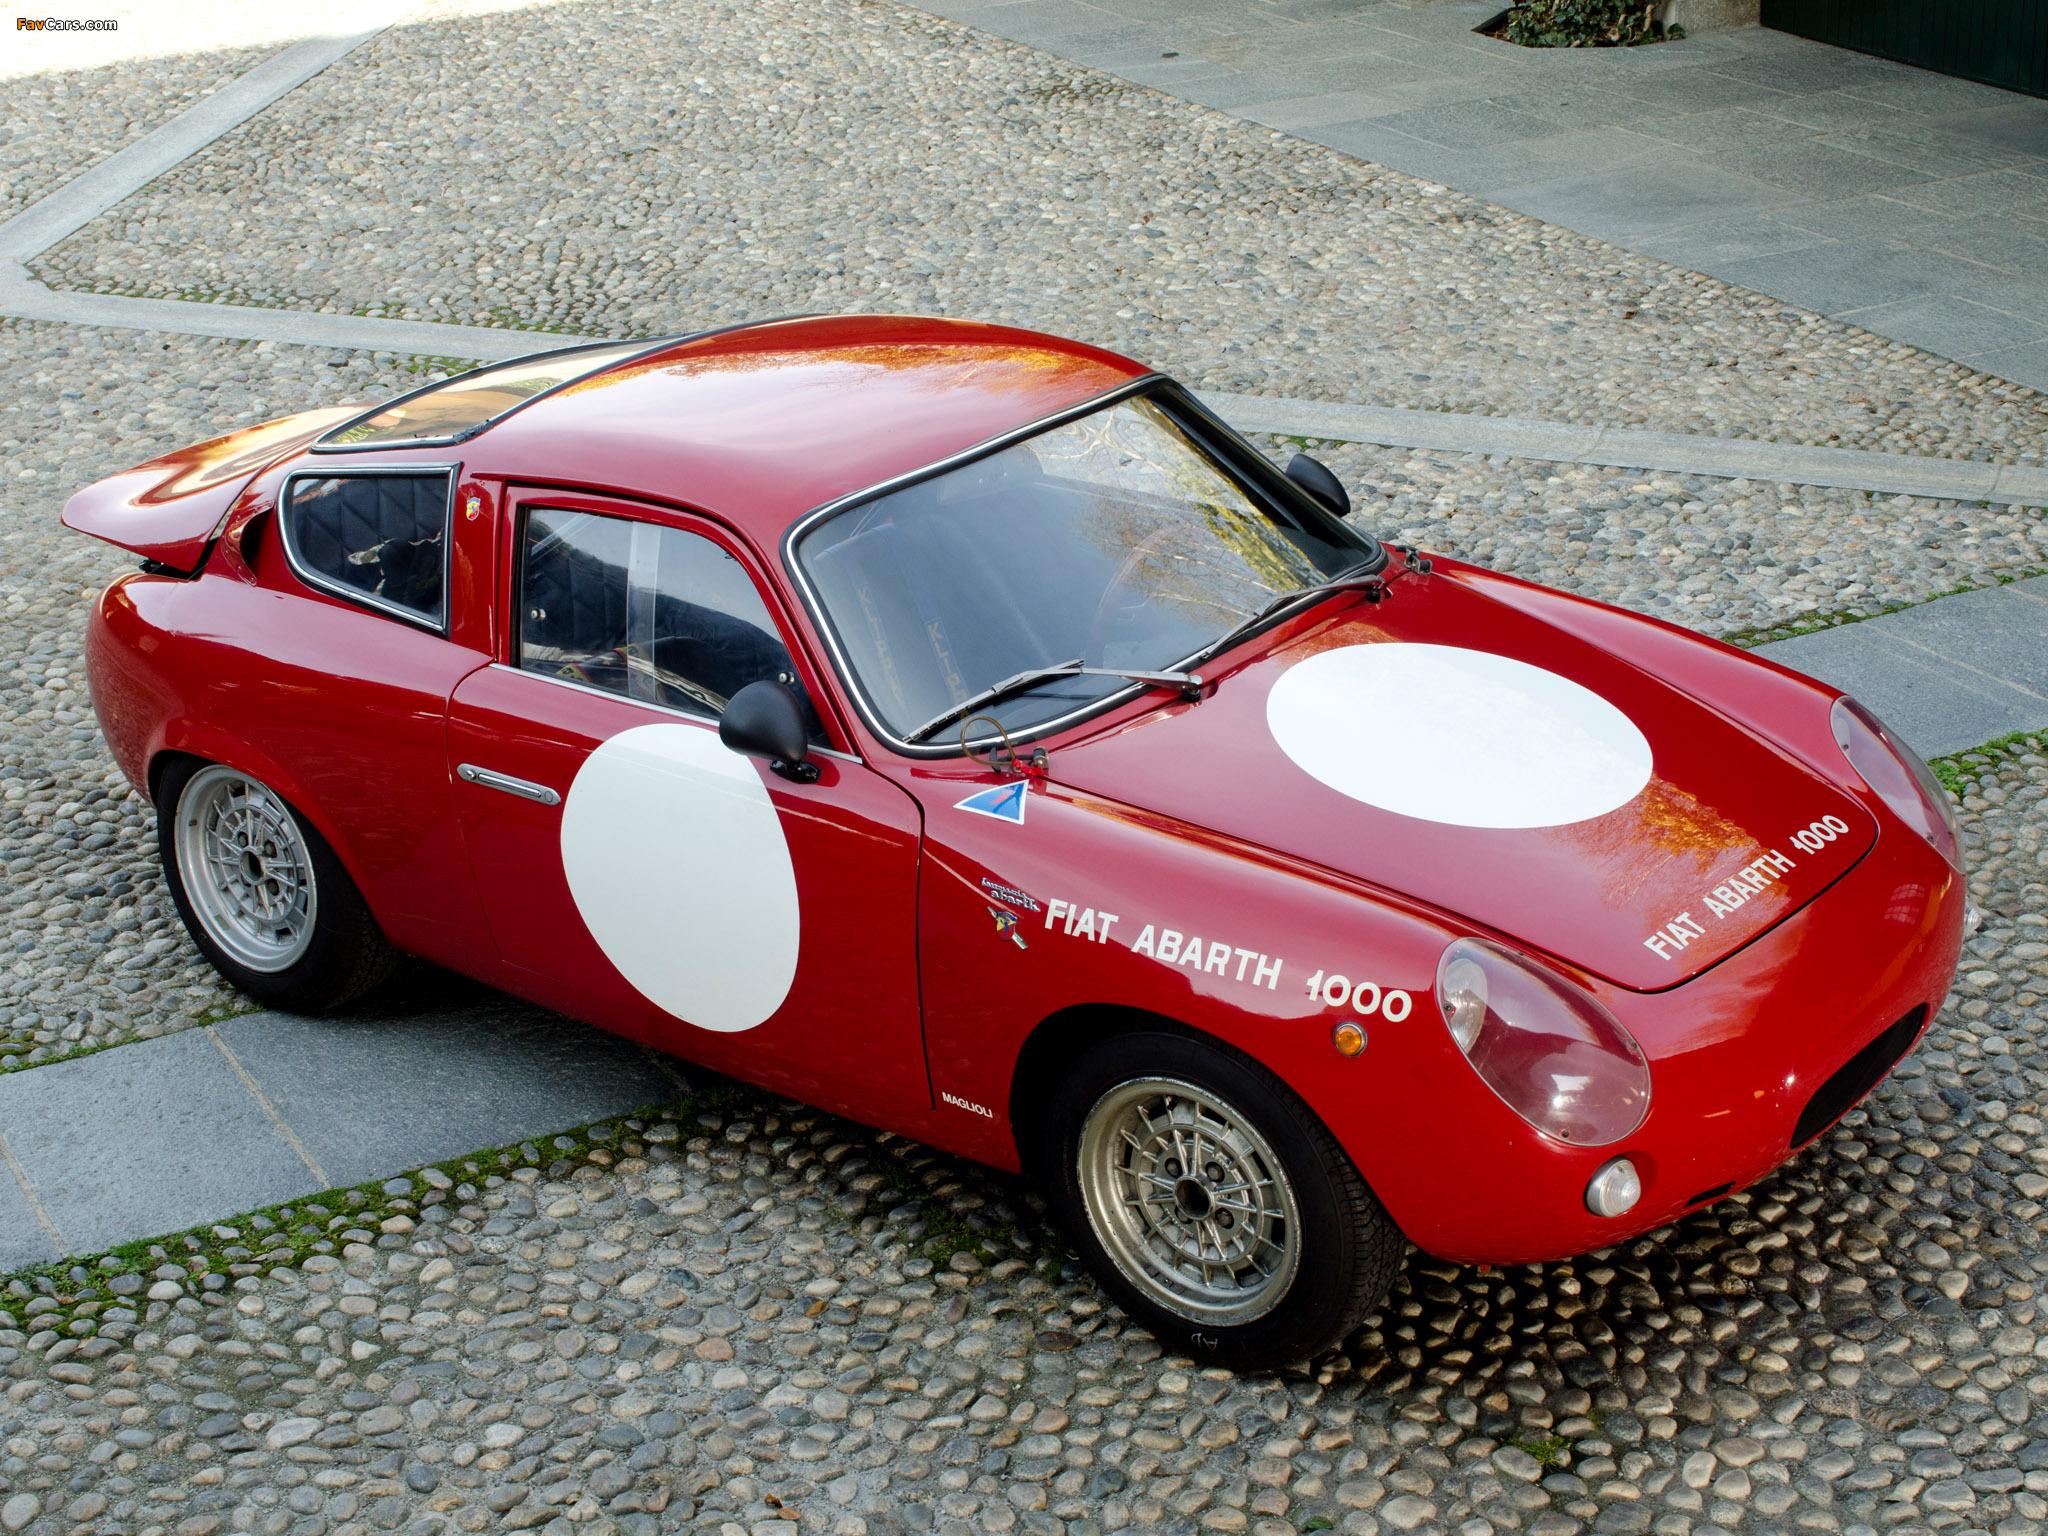 Fiat Abarth 1000 Gt Bialbero 1961 1963 Images 2048x1536